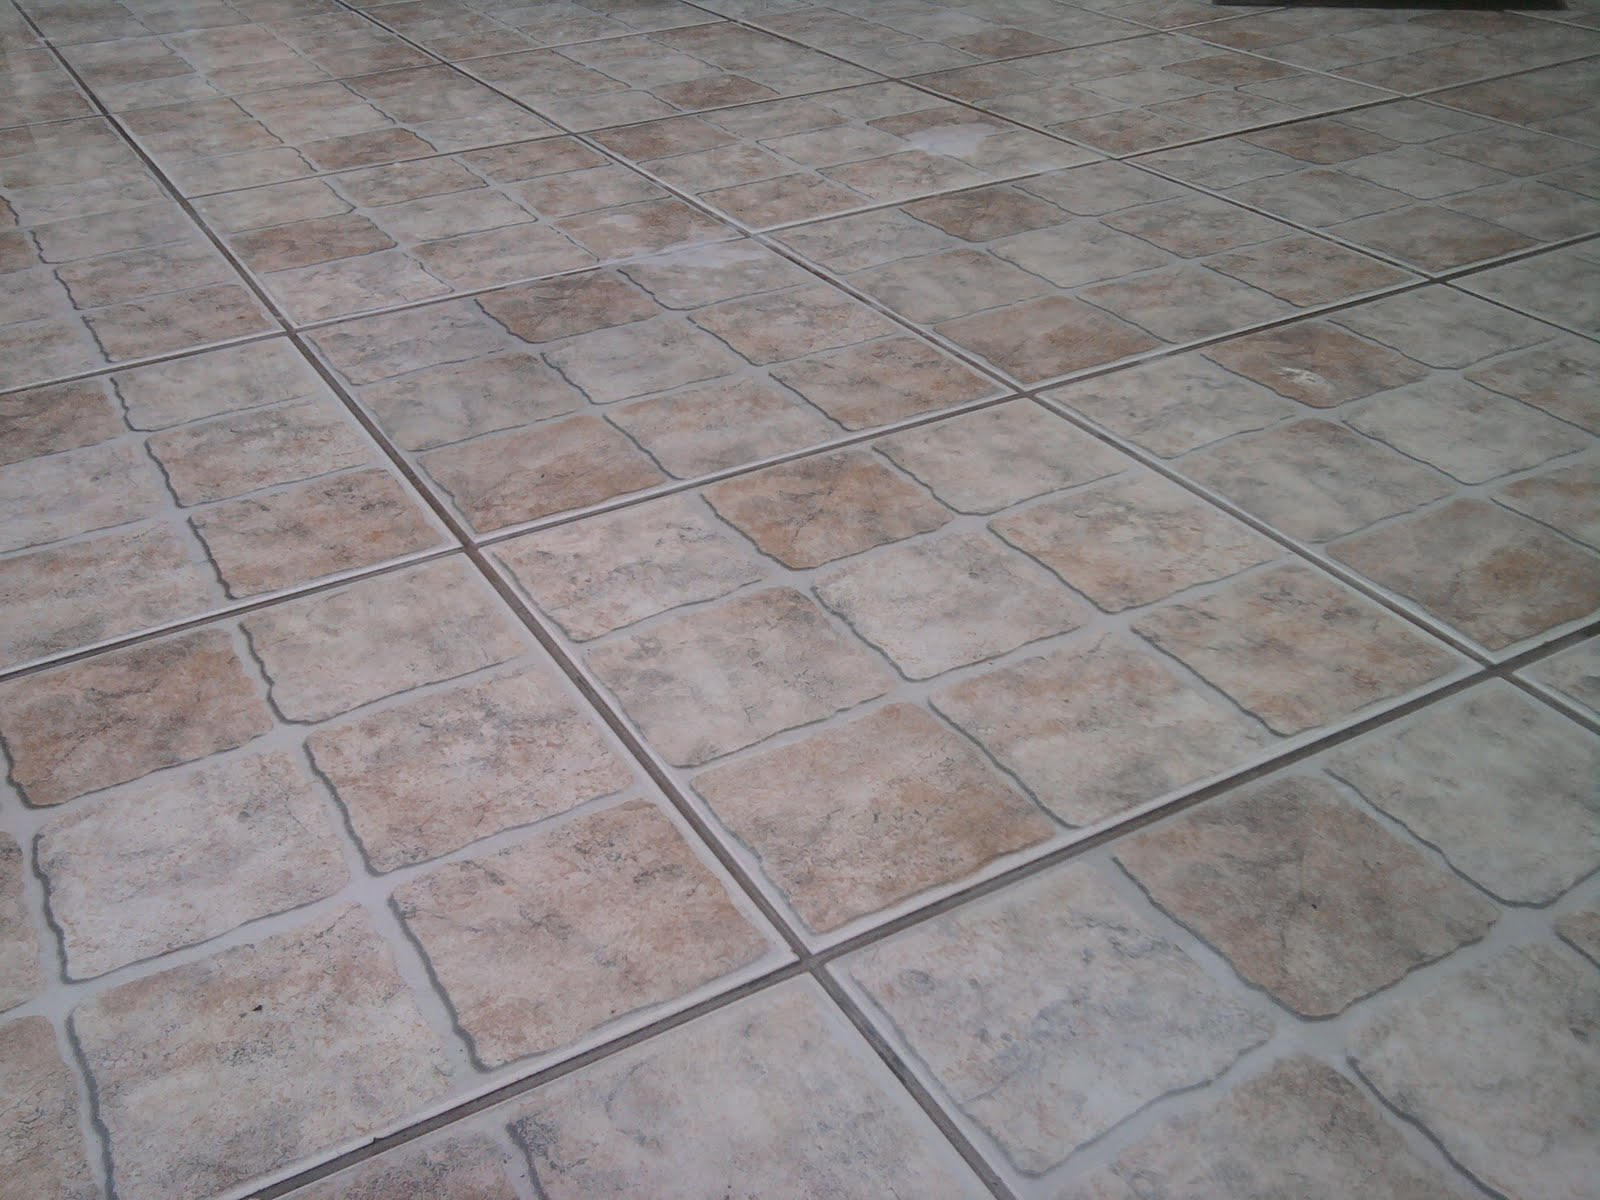 Piso antiderrapante de cermica porcelanato e pedras  Preos  Decorando Casas